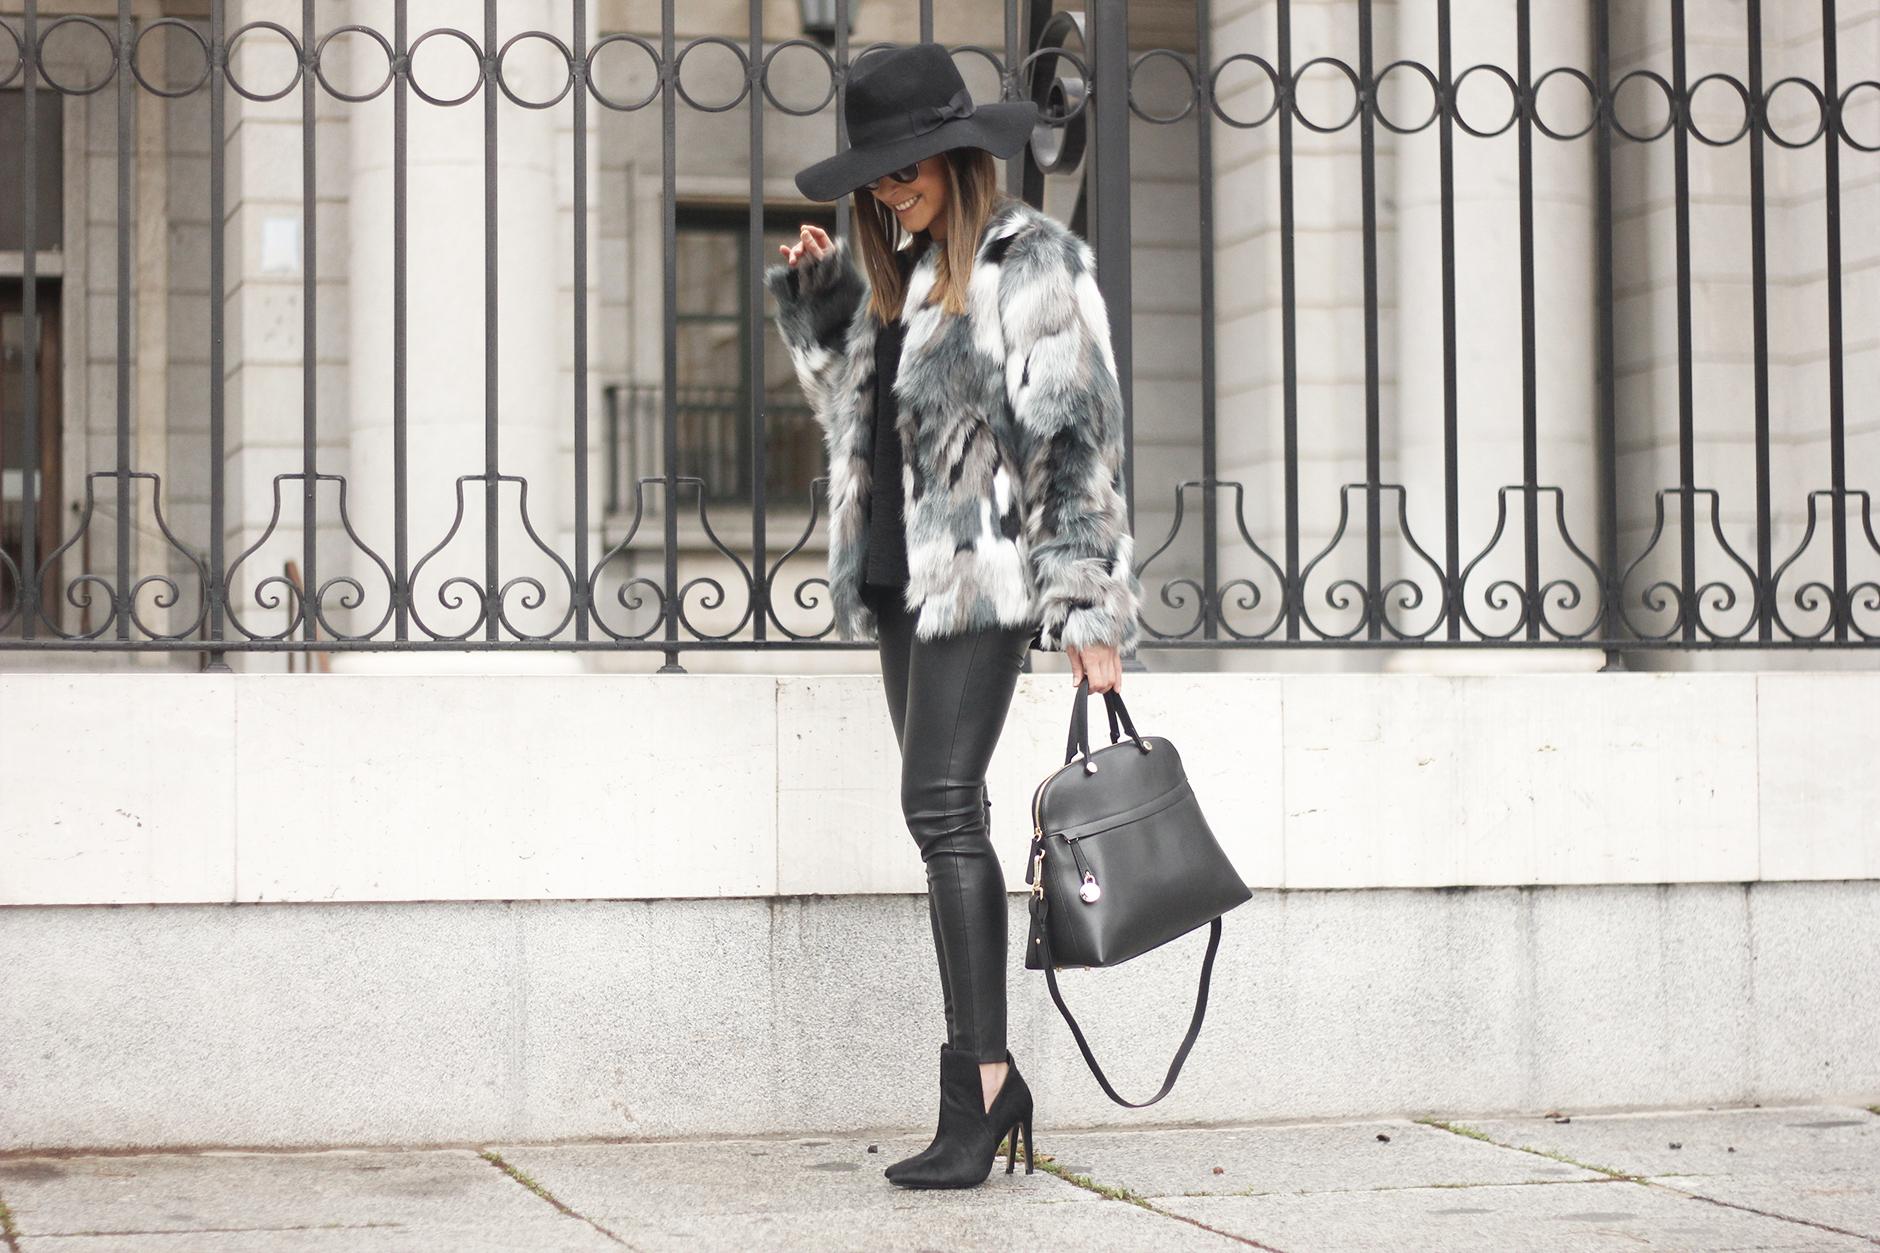 Faux fur coat leatherette pants booties black hat mango streetstyle fashion outfit16